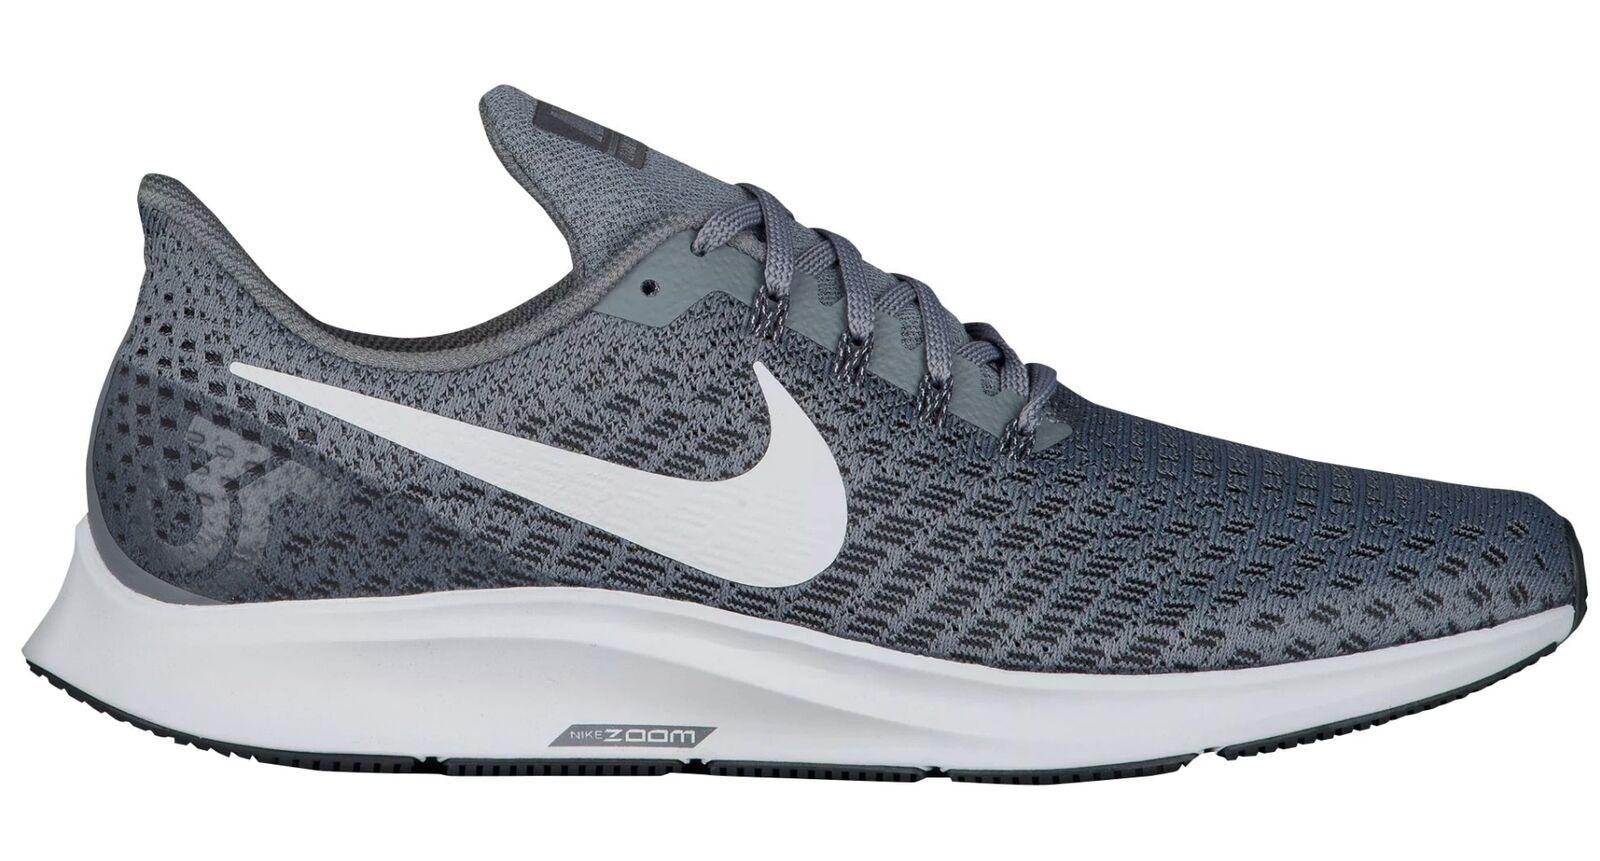 Nike air zoom pegasus 35 männer 942851-005 kühle graue mesh - schuhe der größe 12